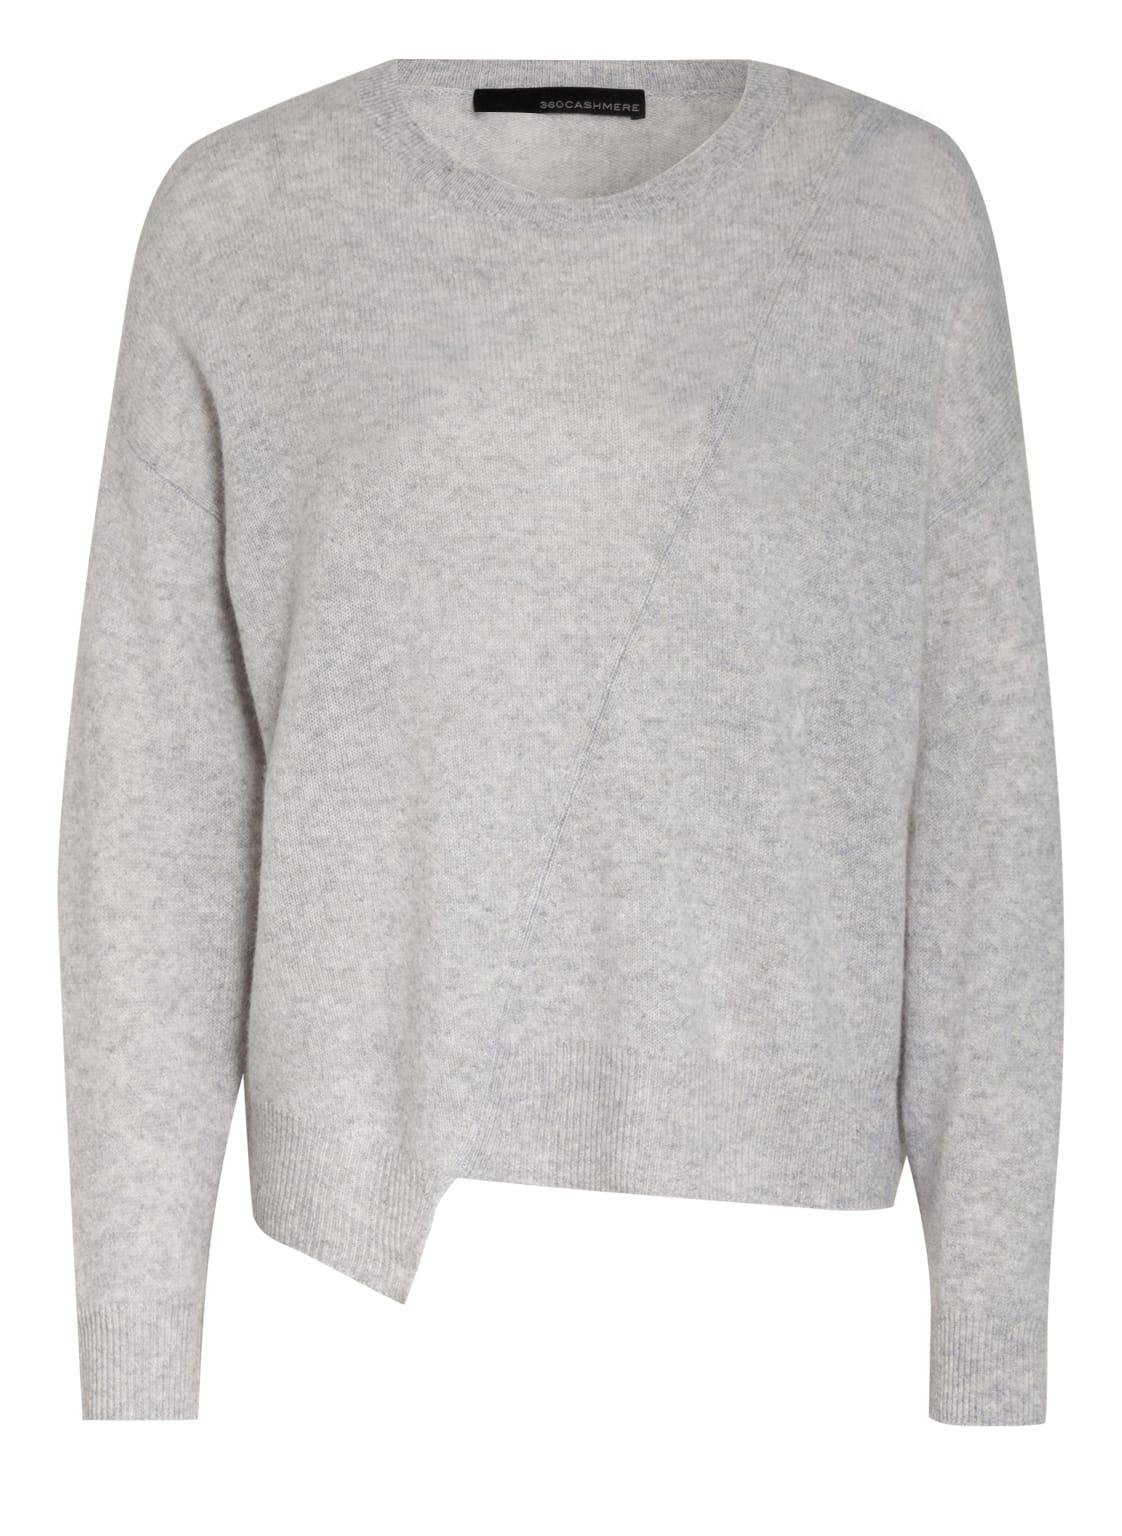 Image of 360cashmere Cashmere-Pullover Eugena grau